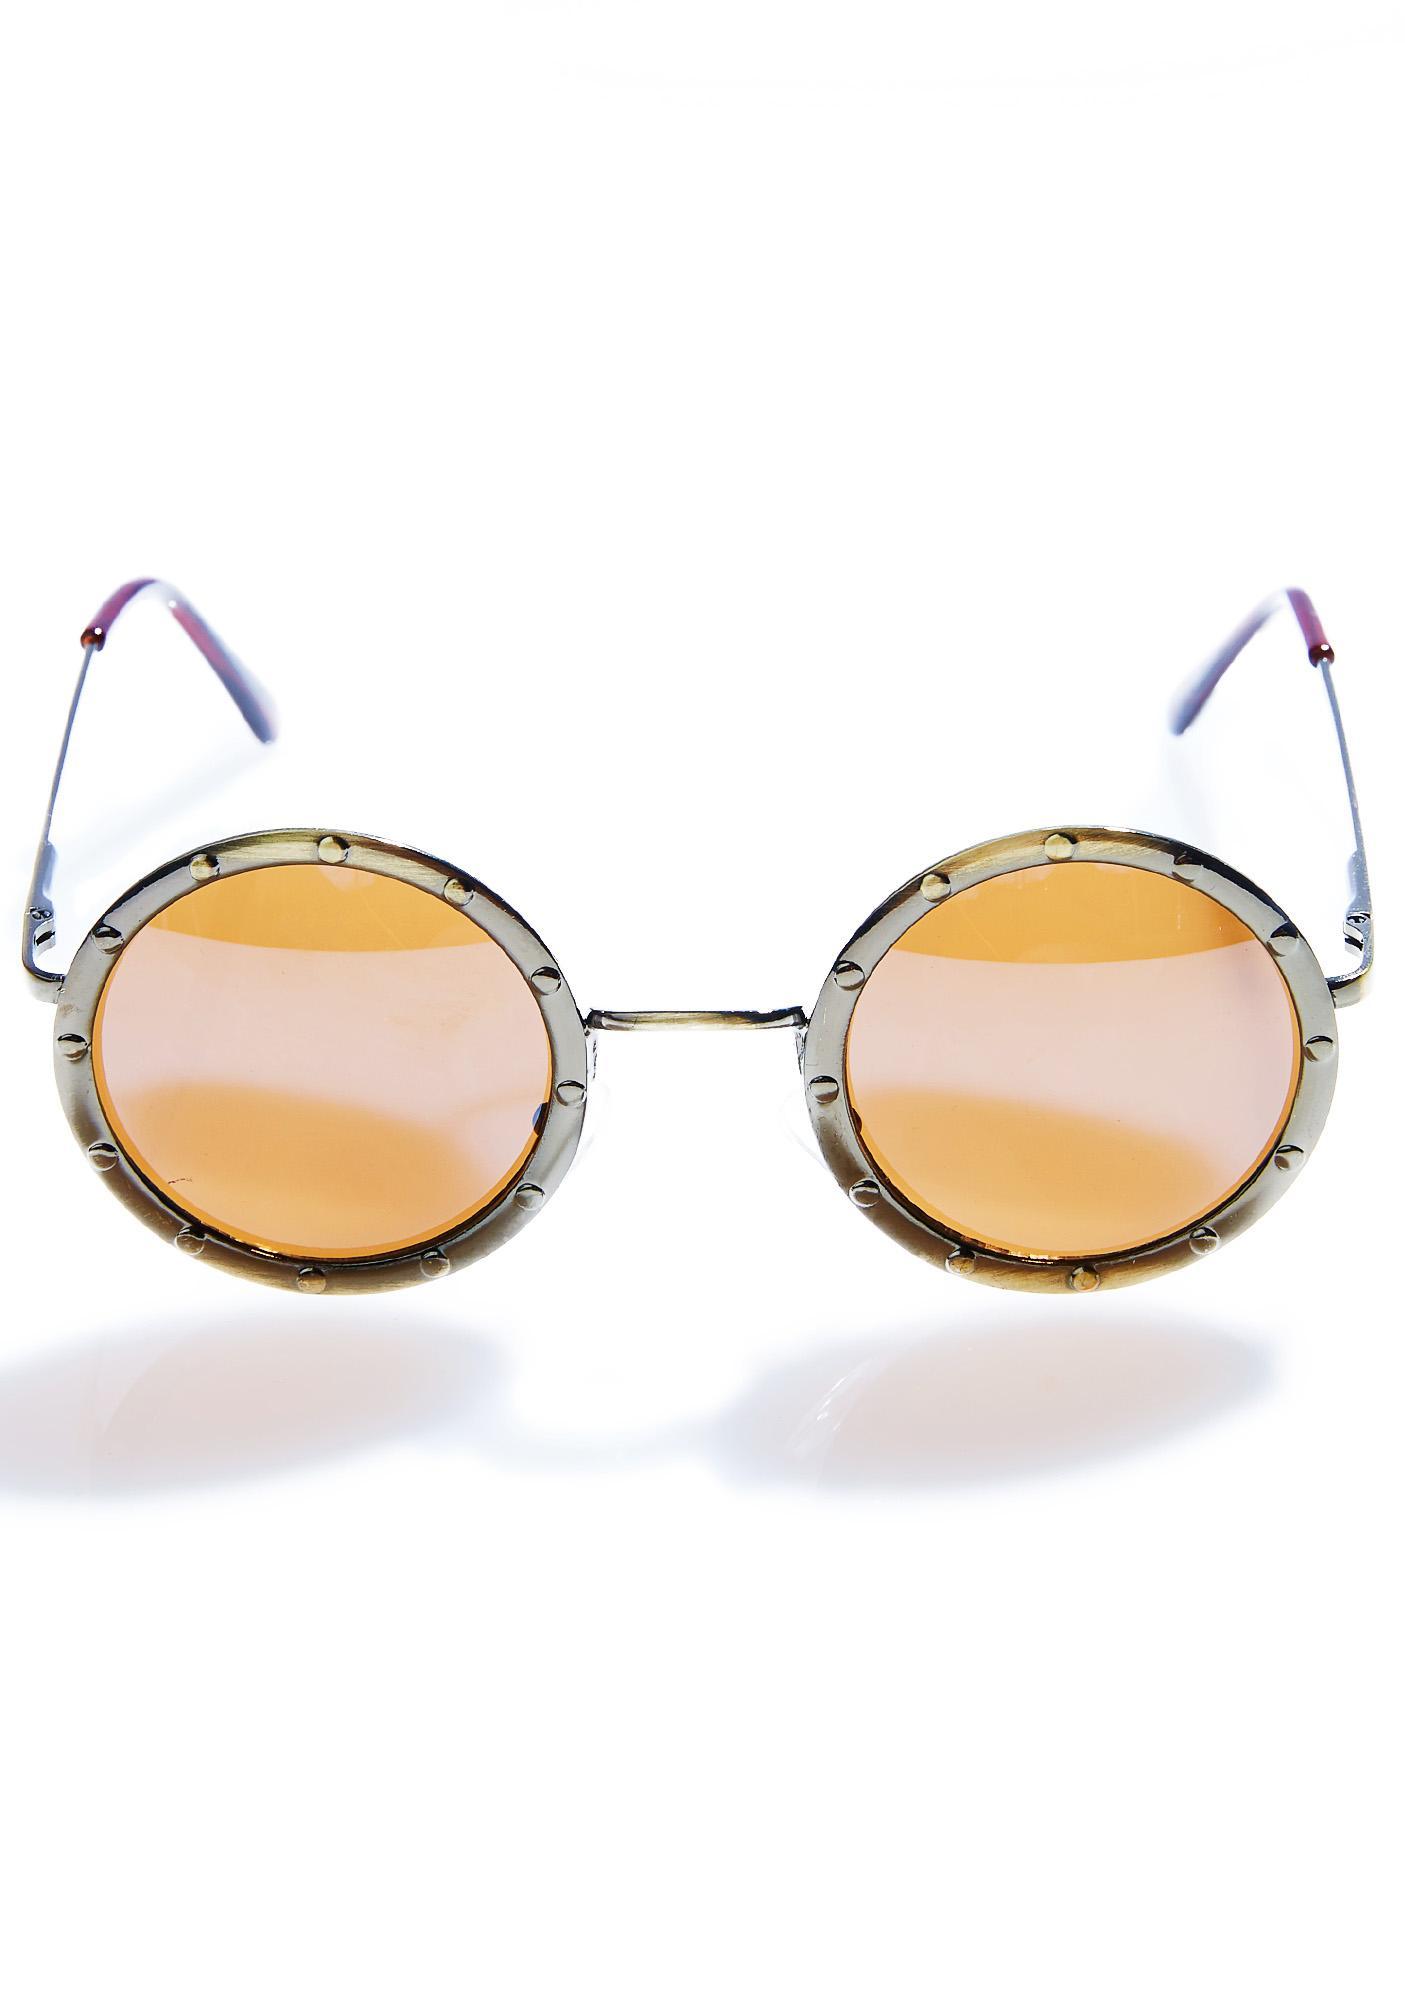 Johnny Sunglasses